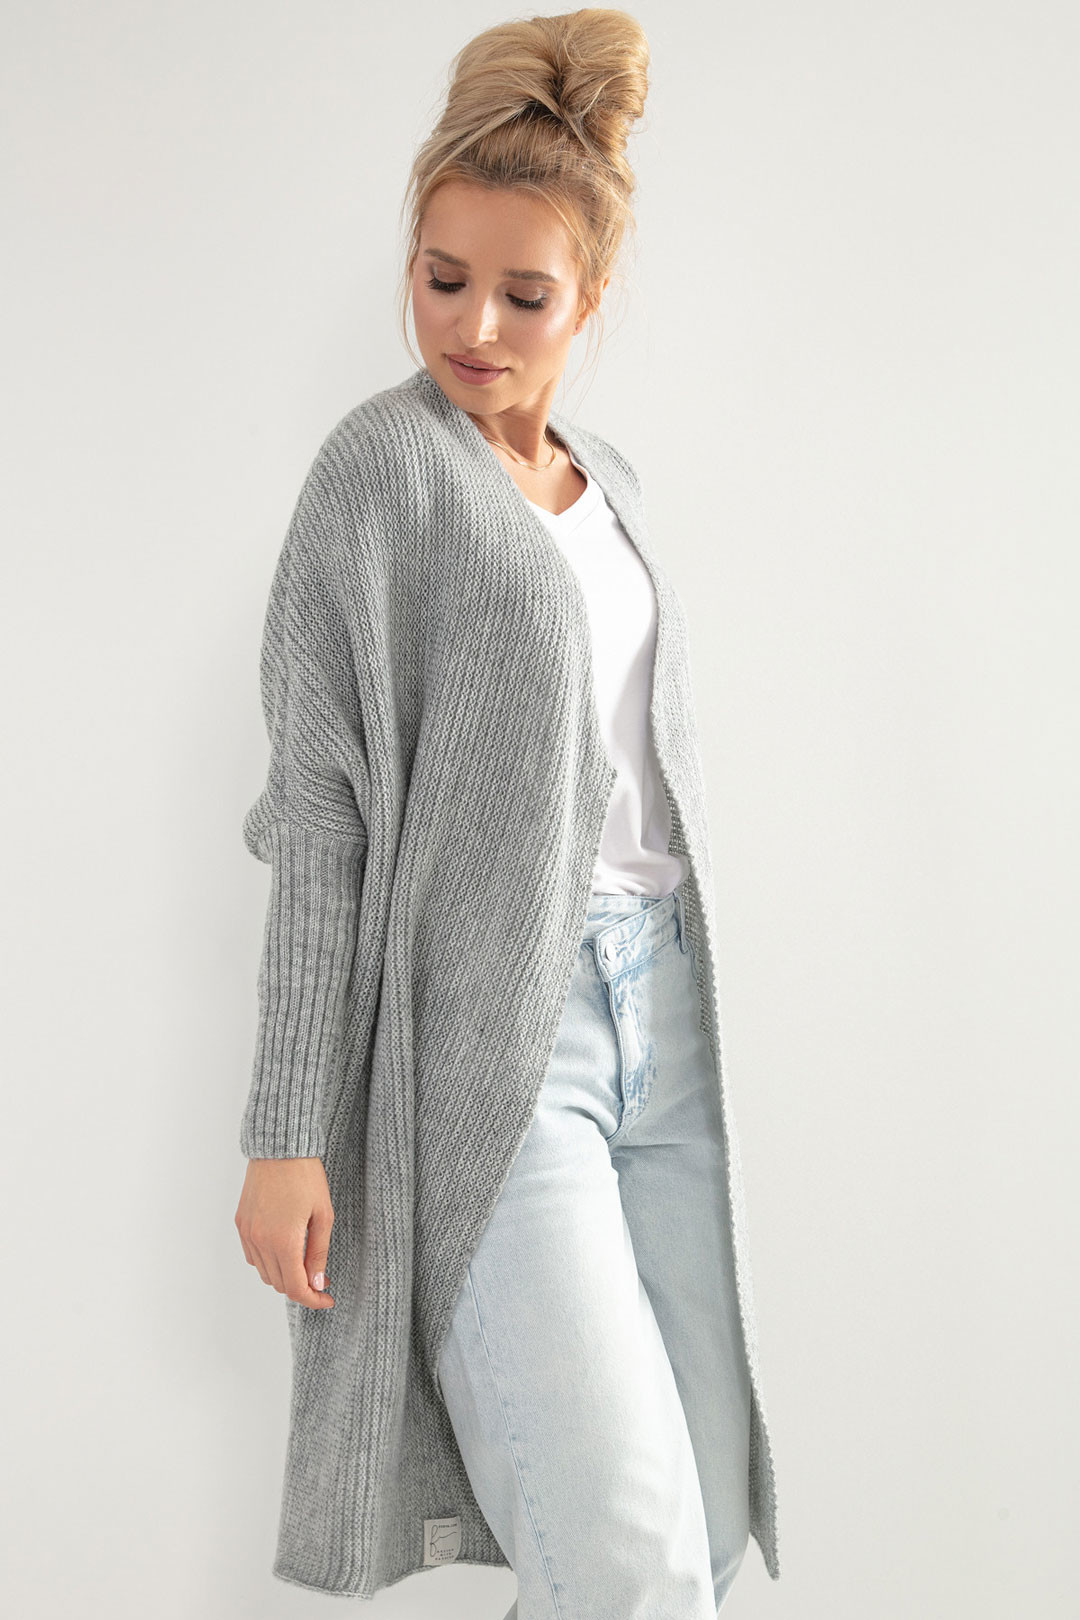 Glara Dámský pletený kabátek kardigan s vlnou 707178